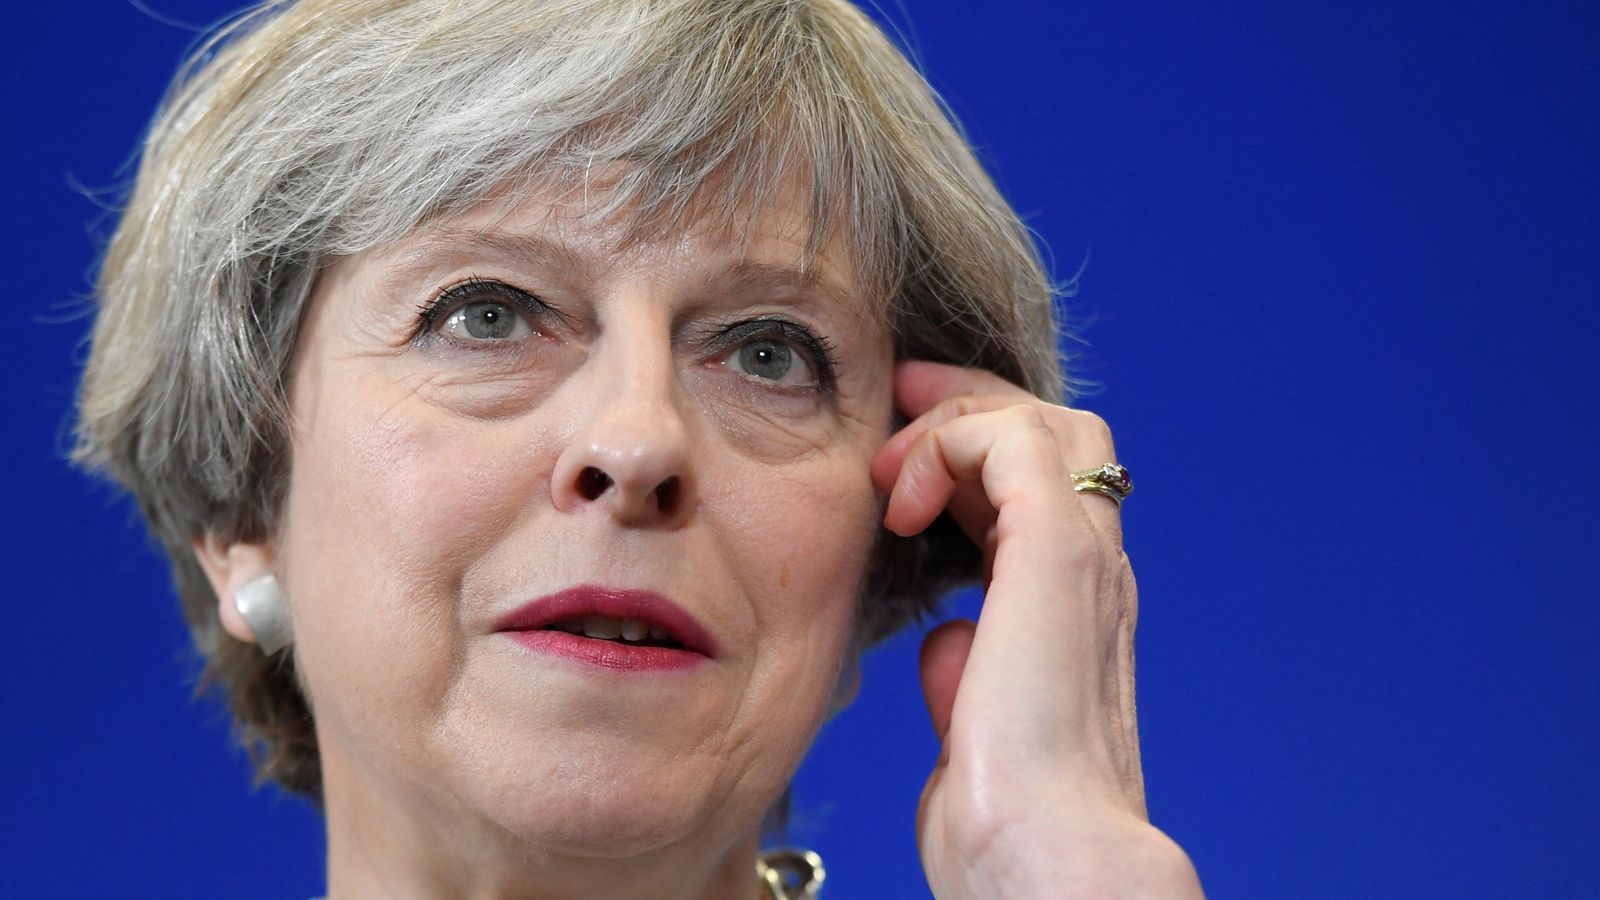 Foto: La primera ministra del Reino Unido, Theresa May, durante un discurso previo las elecciones de junio. (REUTERS)